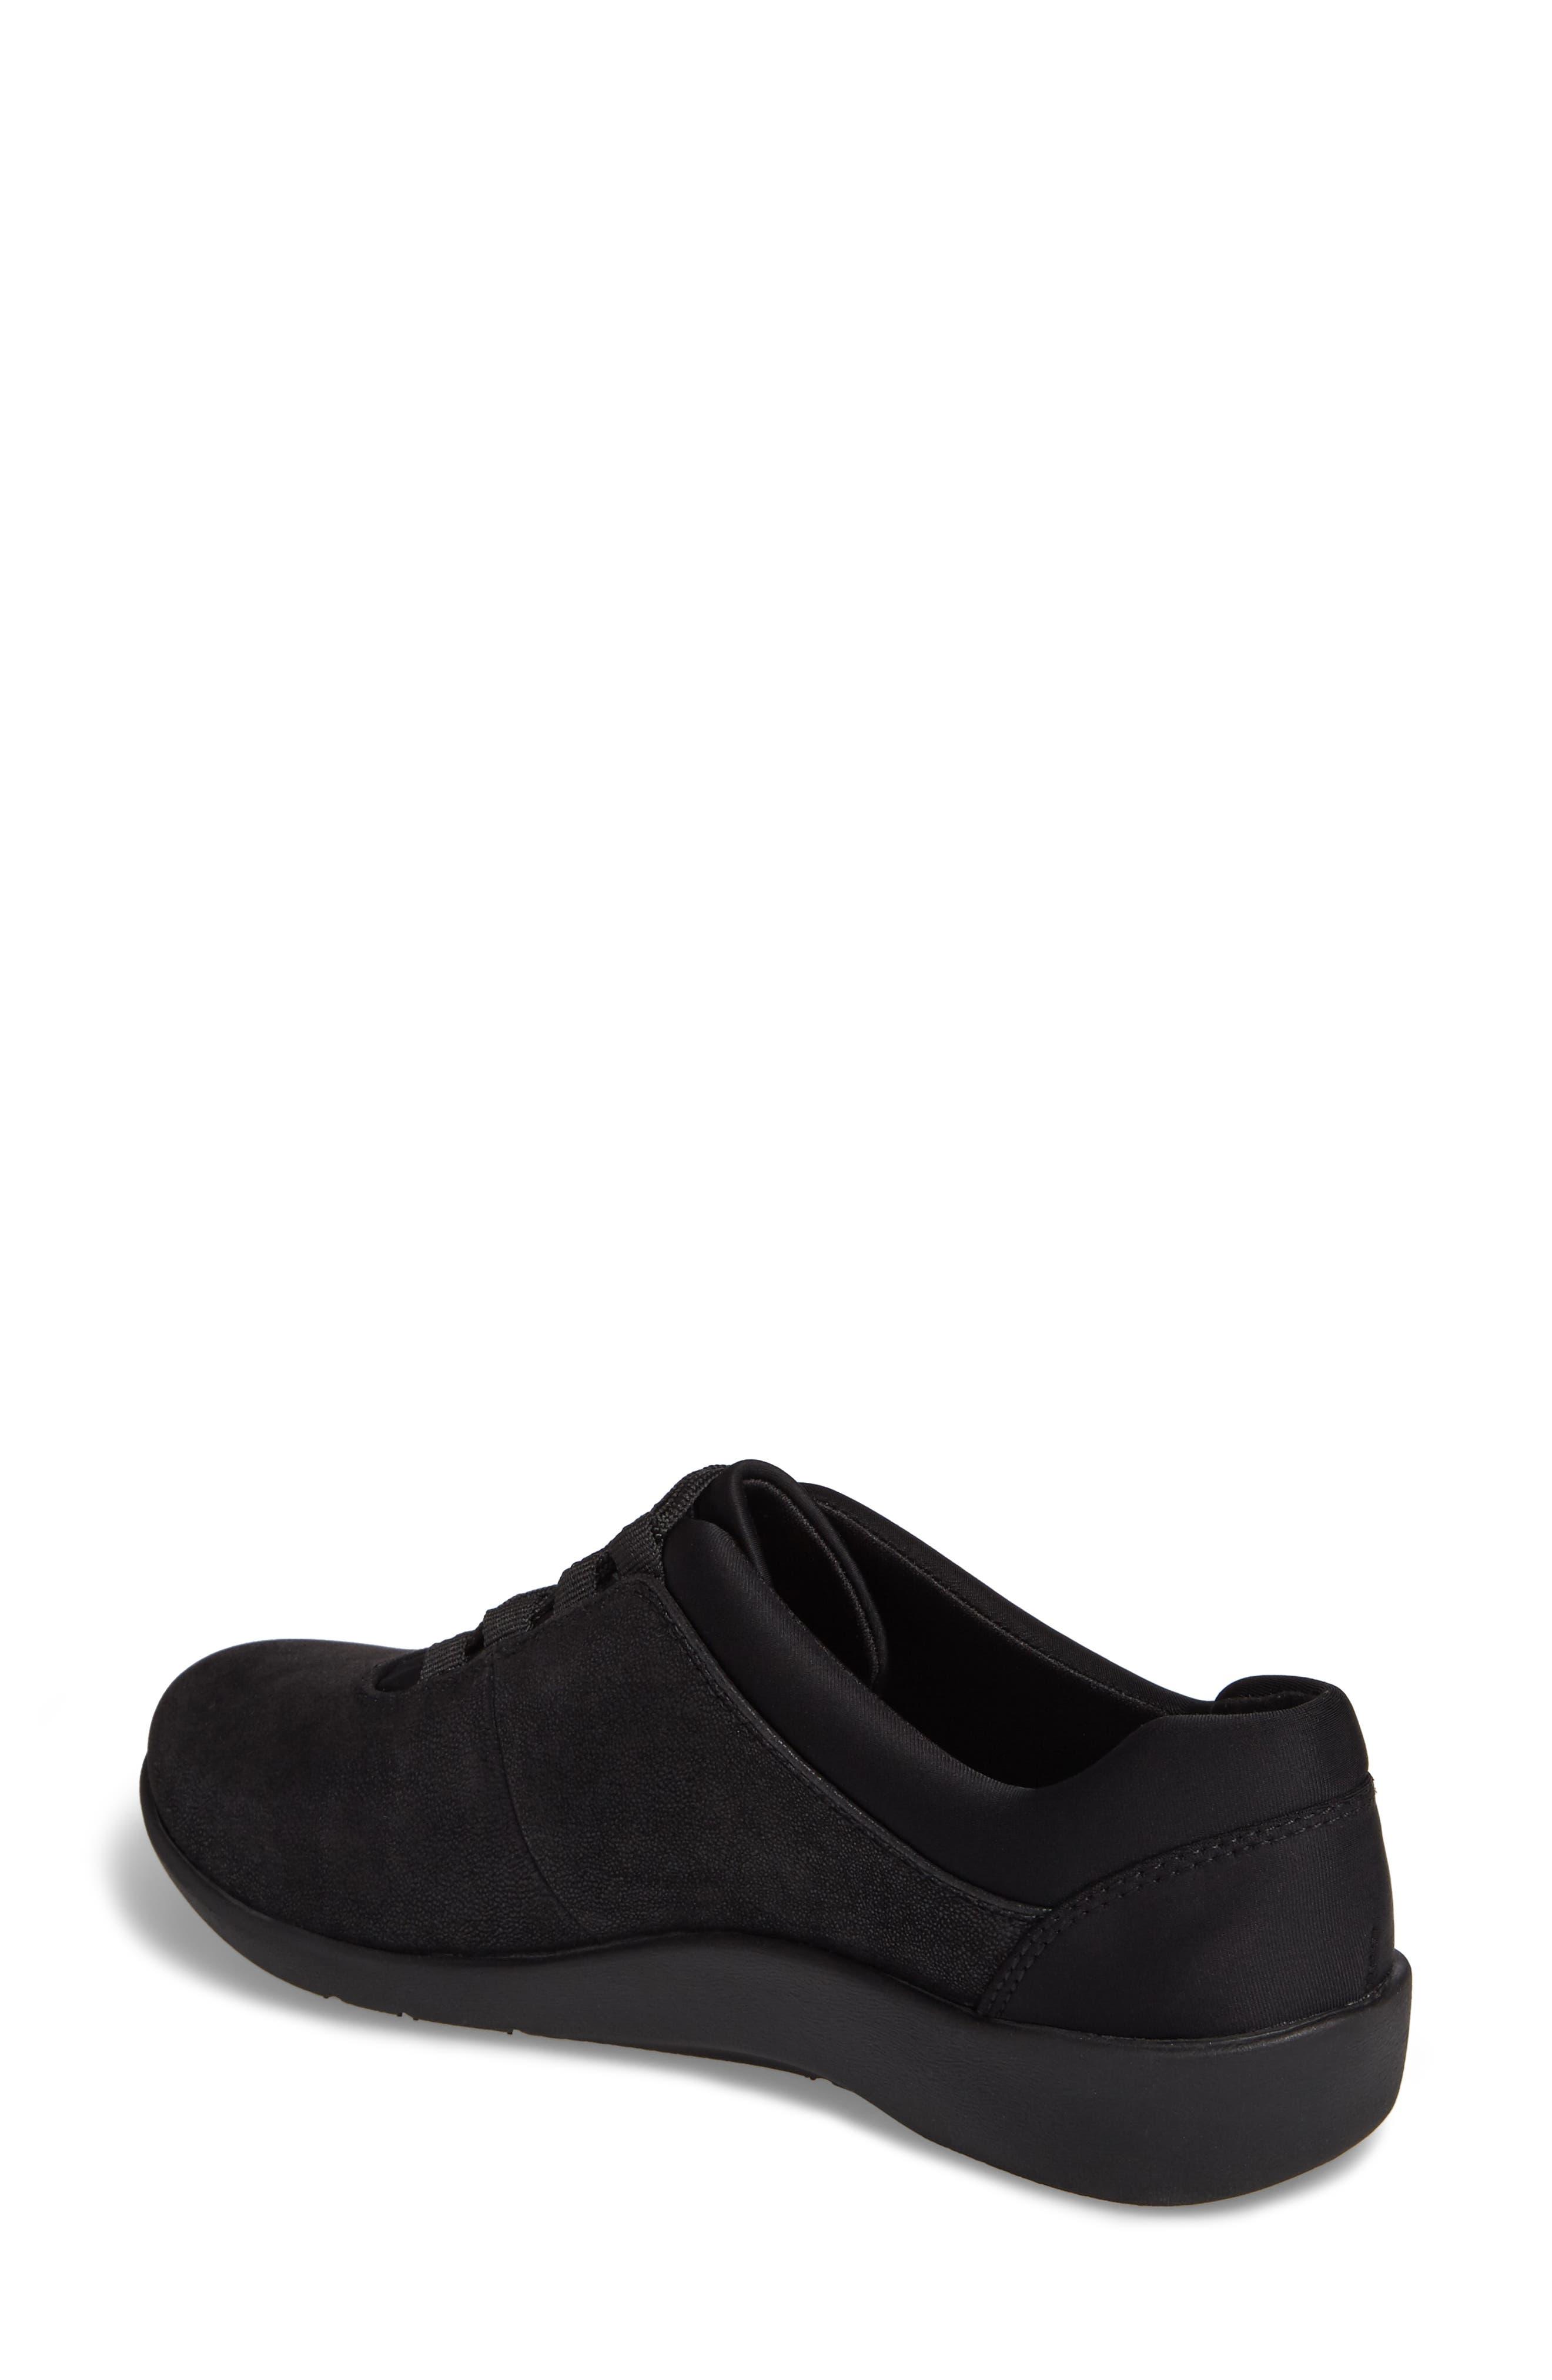 Alternate Image 2  - Clarks® Sillian Pine Sneaker (Women)